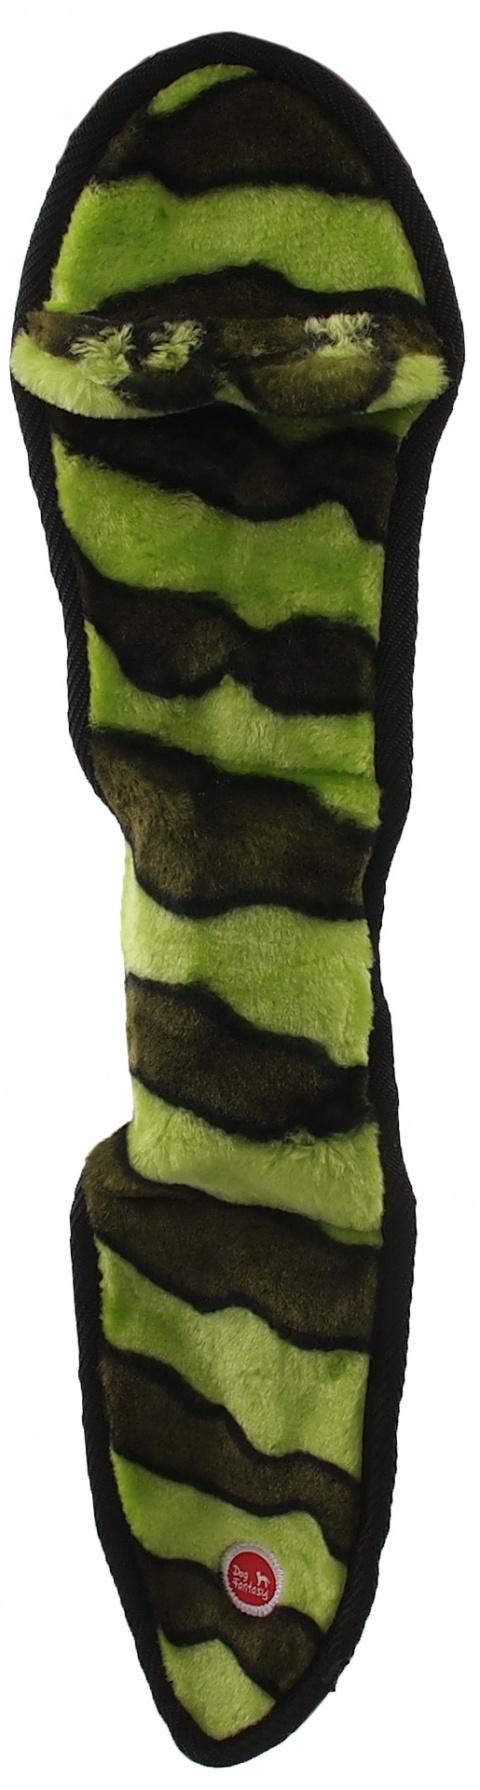 Hračka Dog Fantasy Skinneeez EXTREME had zelený 50cm